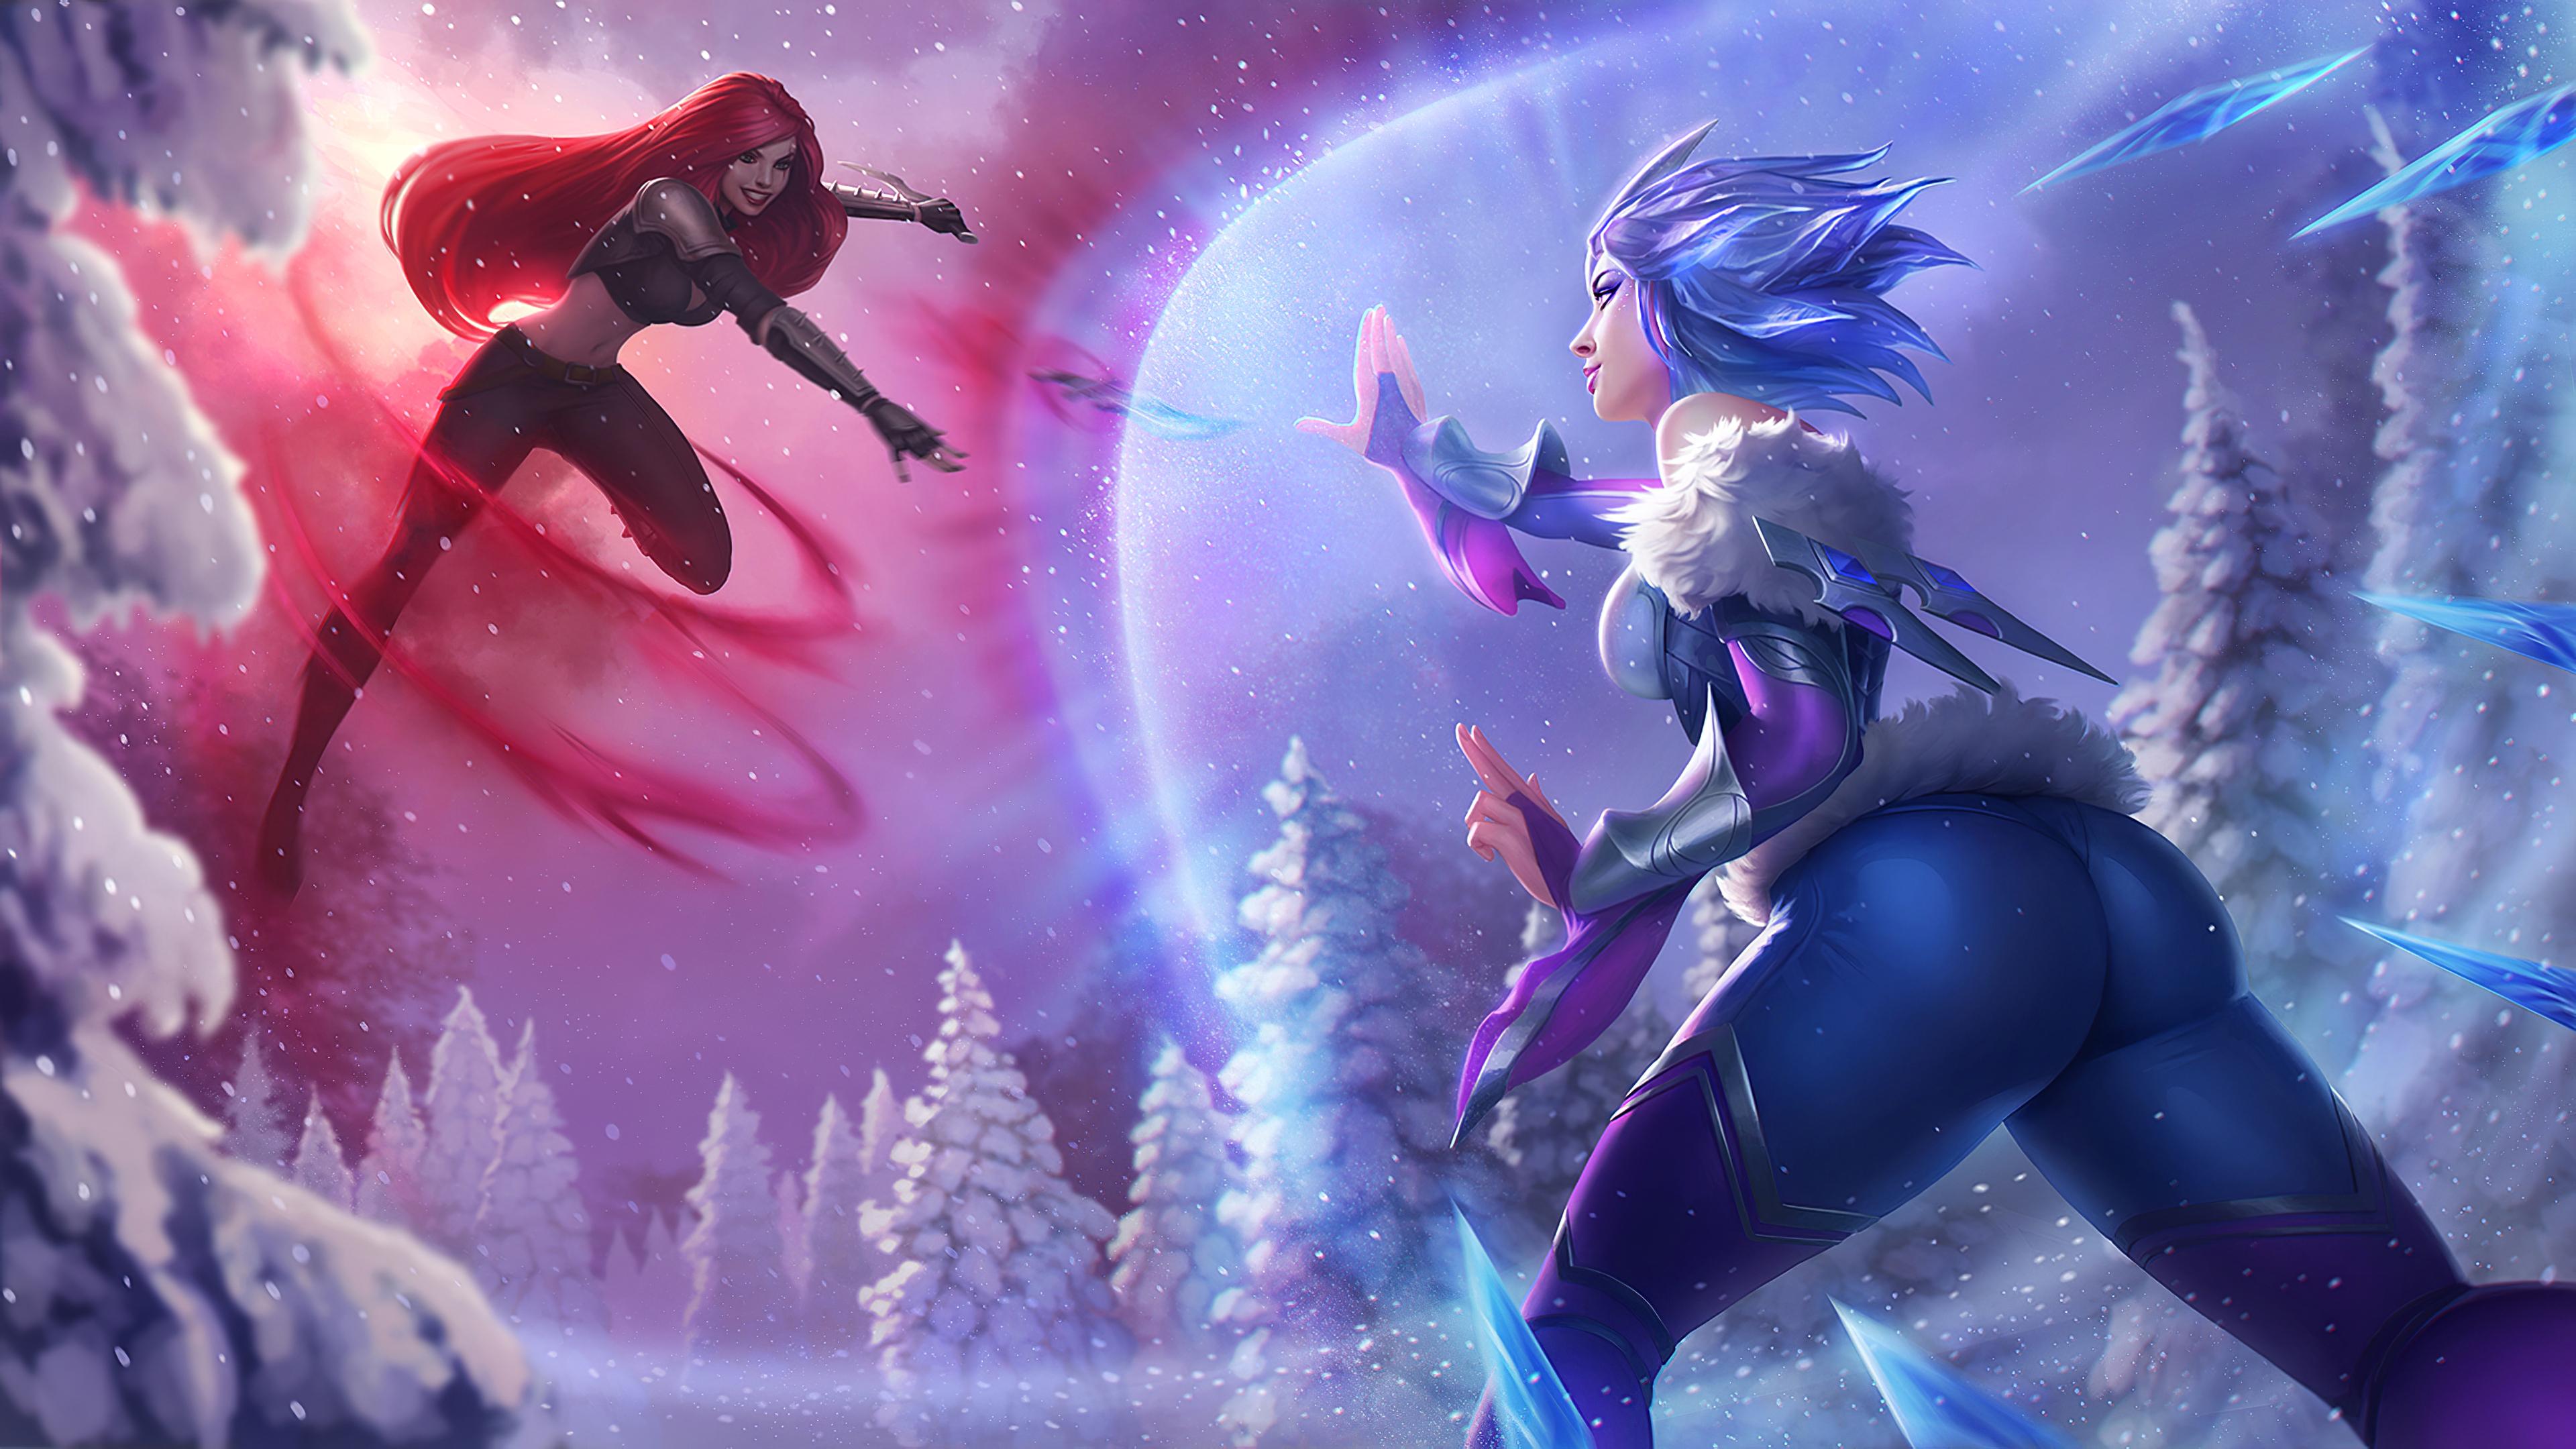 Frostblade Irelia Vs Katarina League Of Legends 4k Hd Games 4k